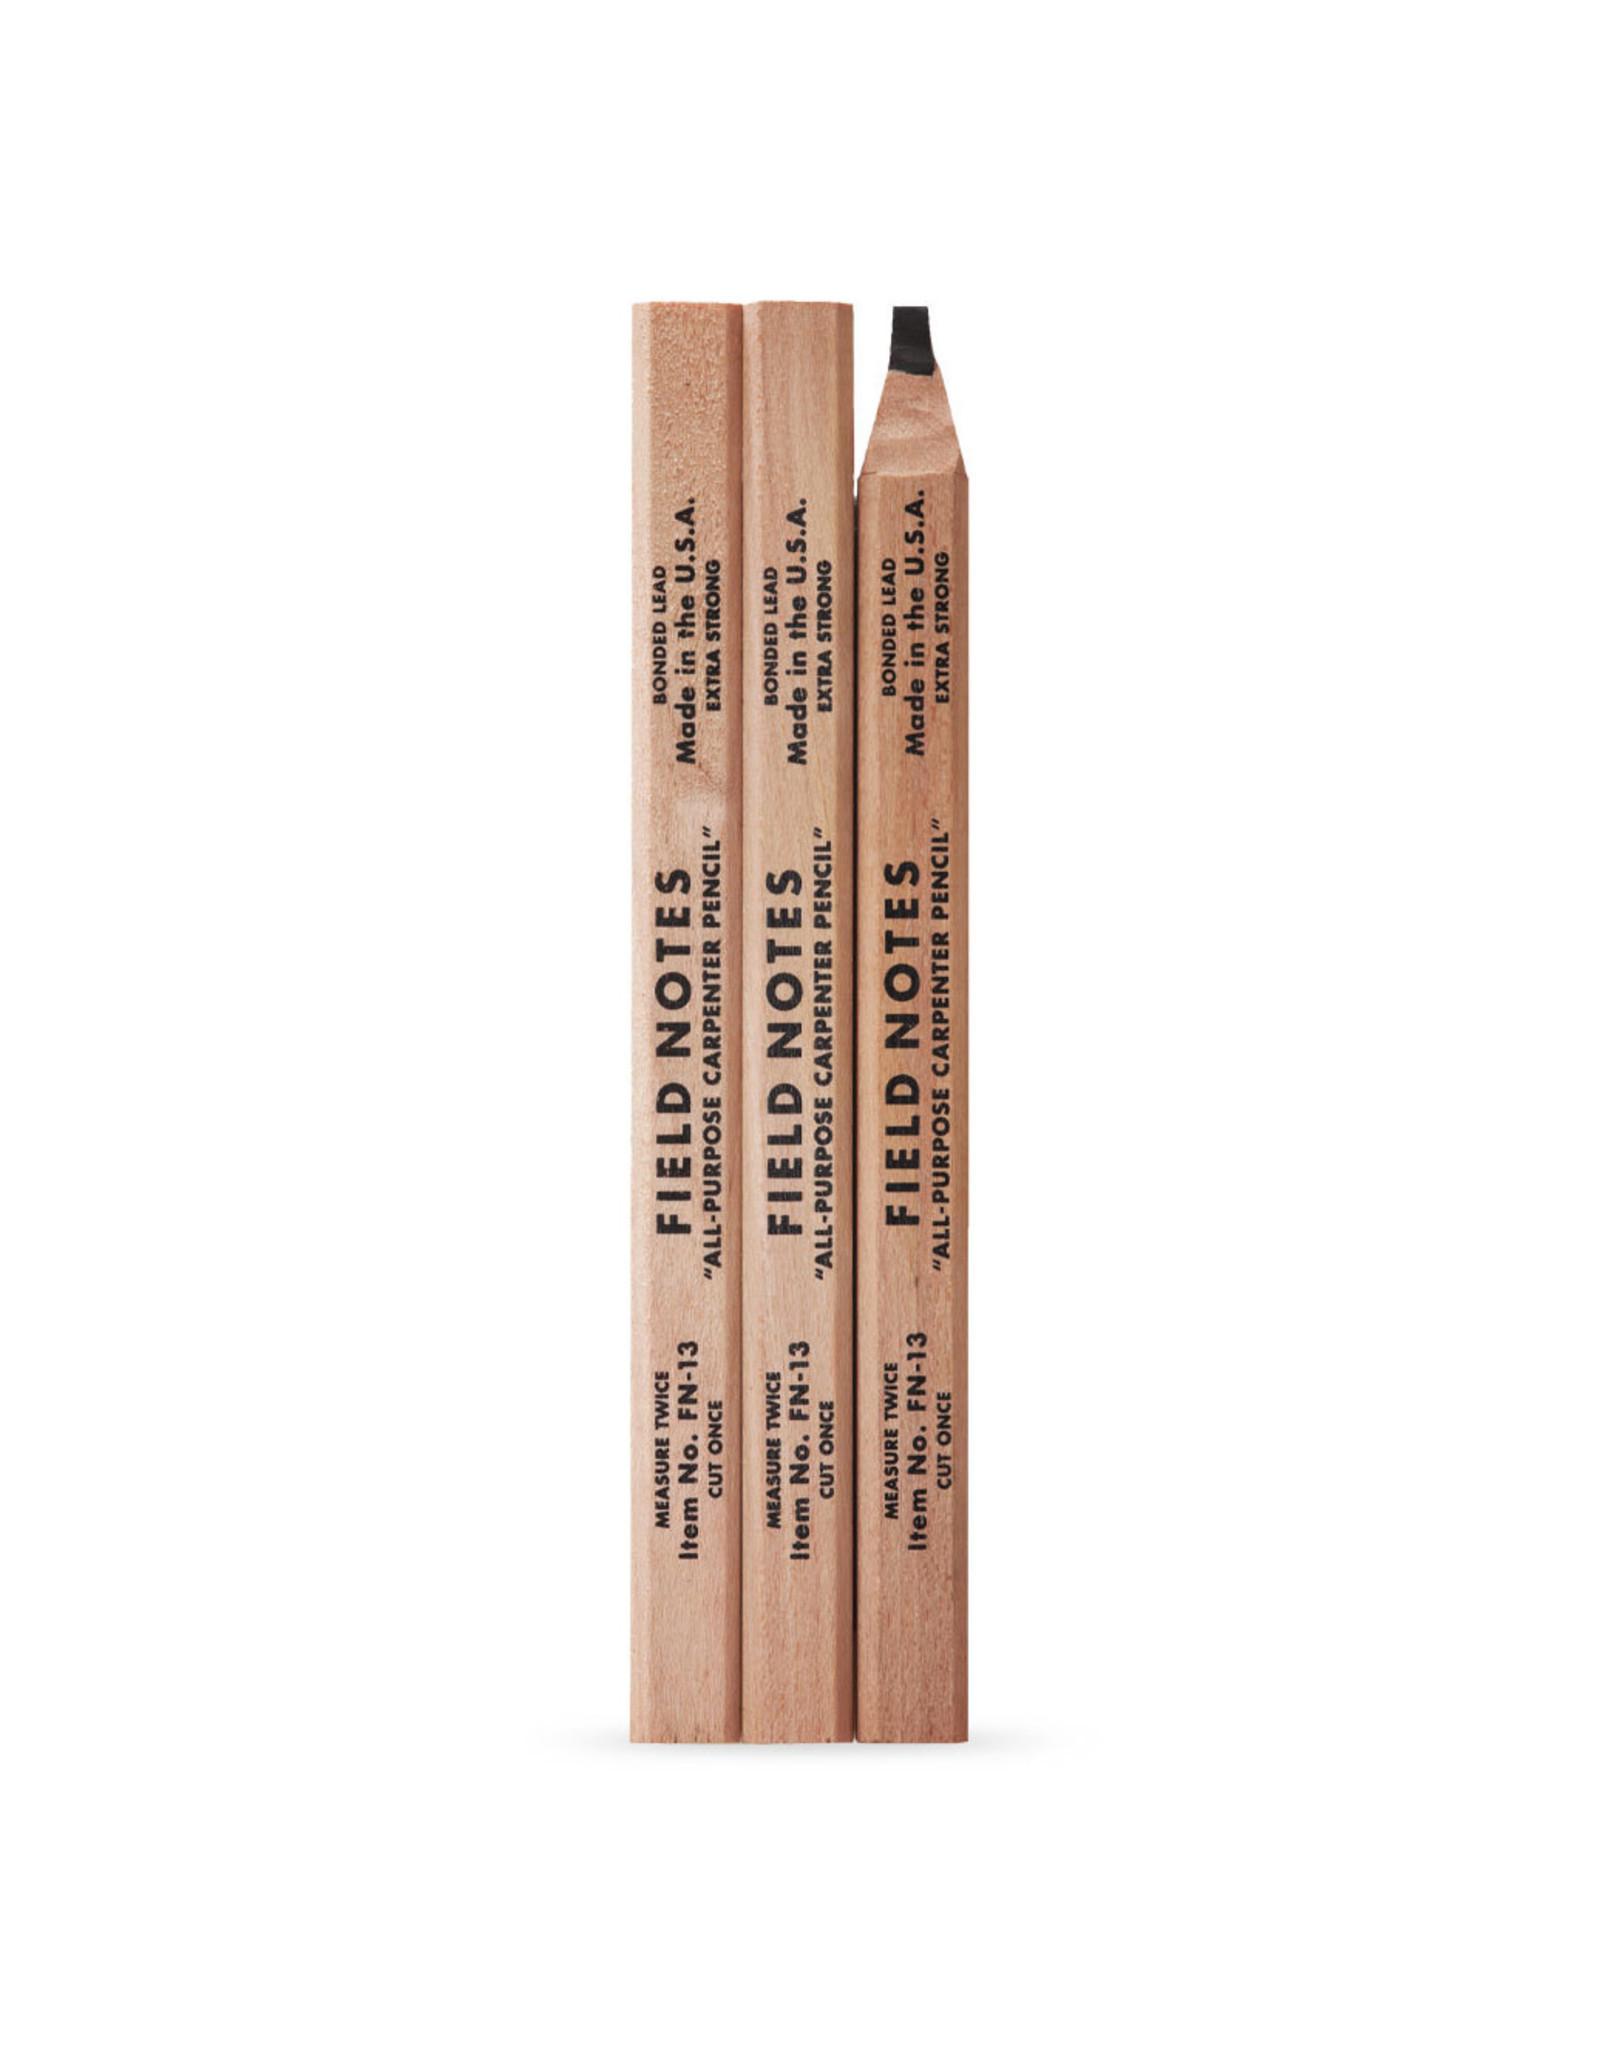 Field Notes Brand Carpenter Pencils 3-Pack